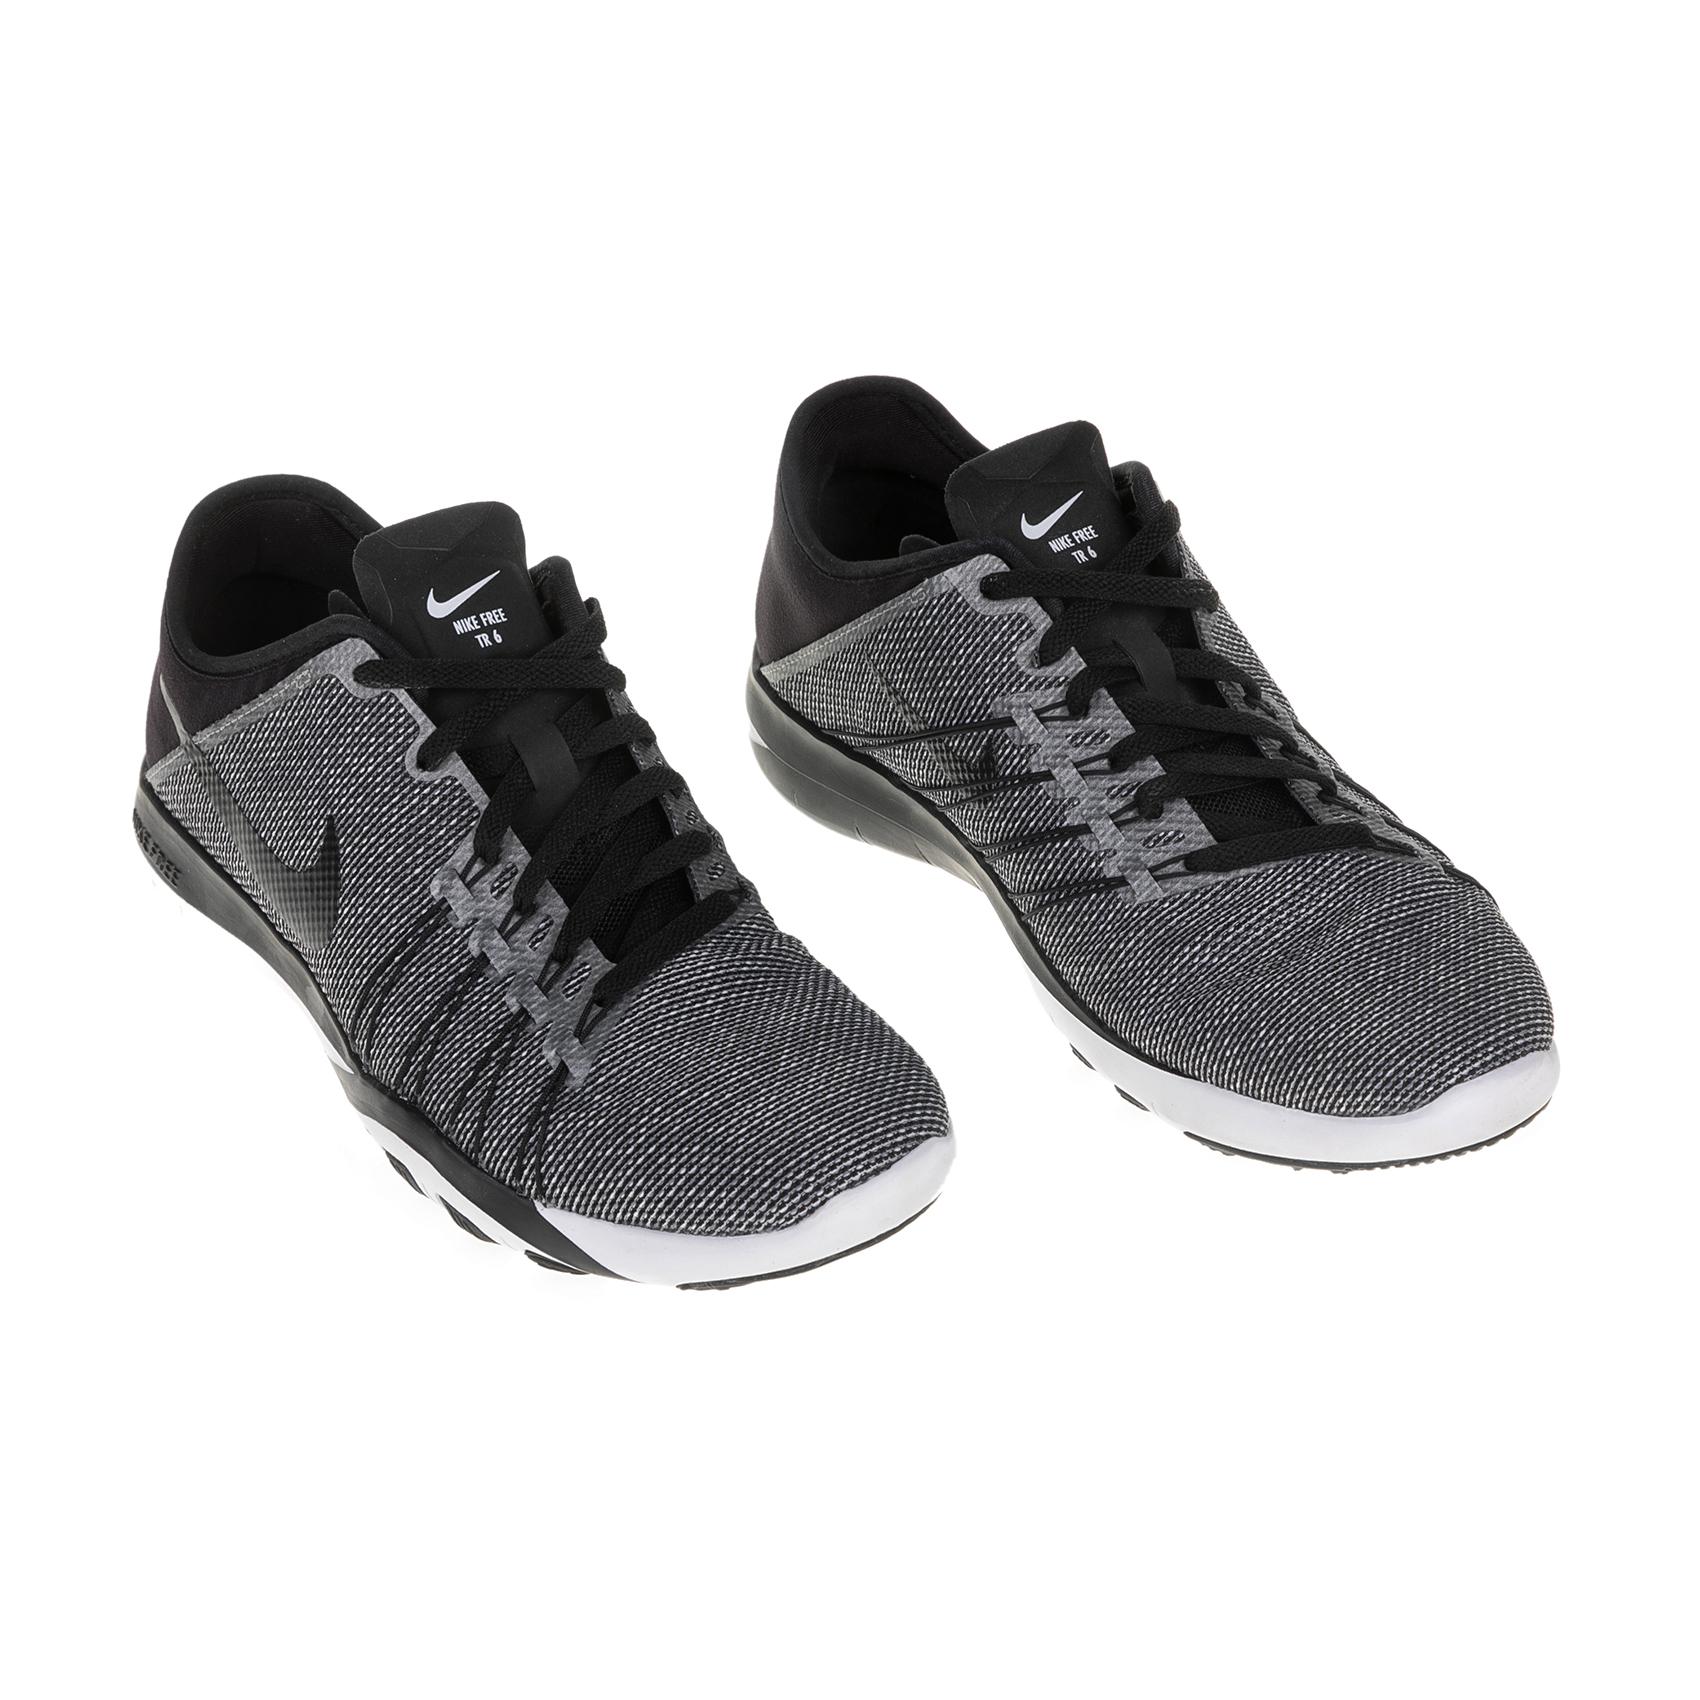 446b765d19e NIKE - Γυναικεία αθλητικά παπούτσια Nike FREE TR 6 PRT μαύρα - γκρι,  Γυναικεία διάφορα αθλητικά παπούτσια, ΓΥΝΑΙΚΑ | ΠΑΠΟΥΤΣΙΑ | ΔΙΑΦΟΡΑ